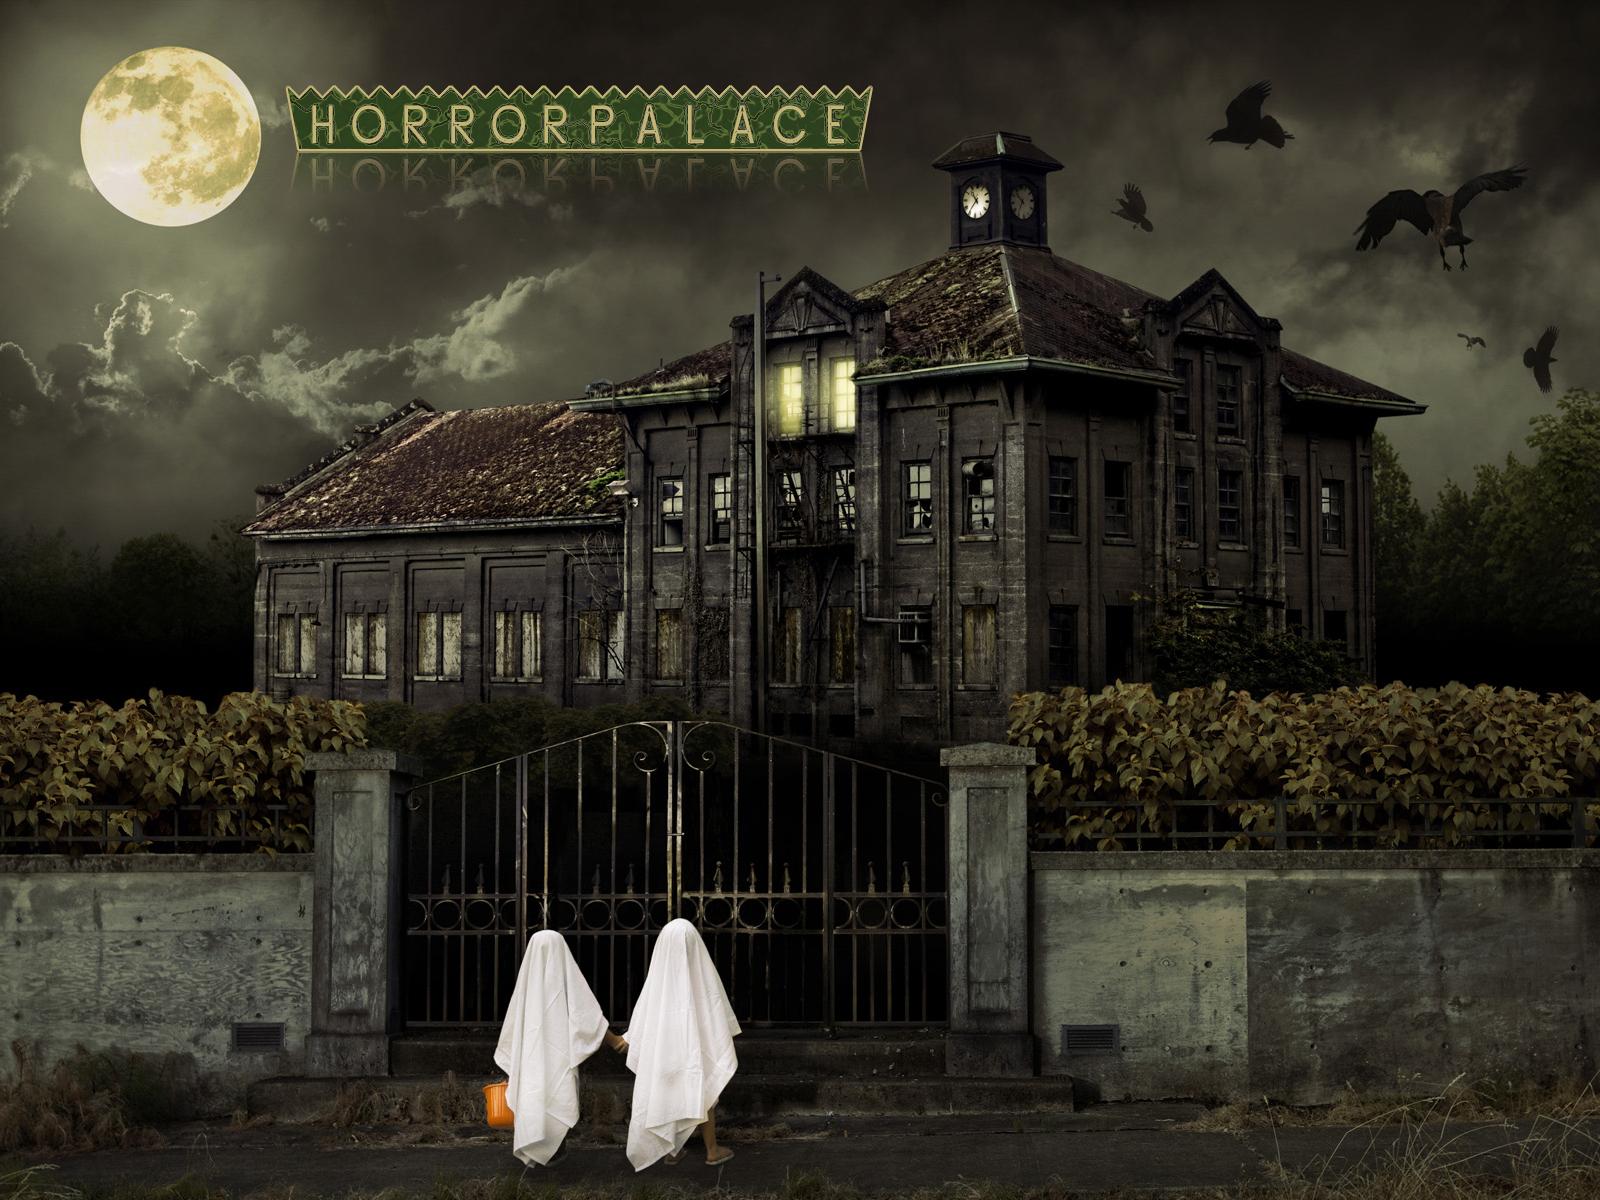 HorrorPalaceArt600.jpg